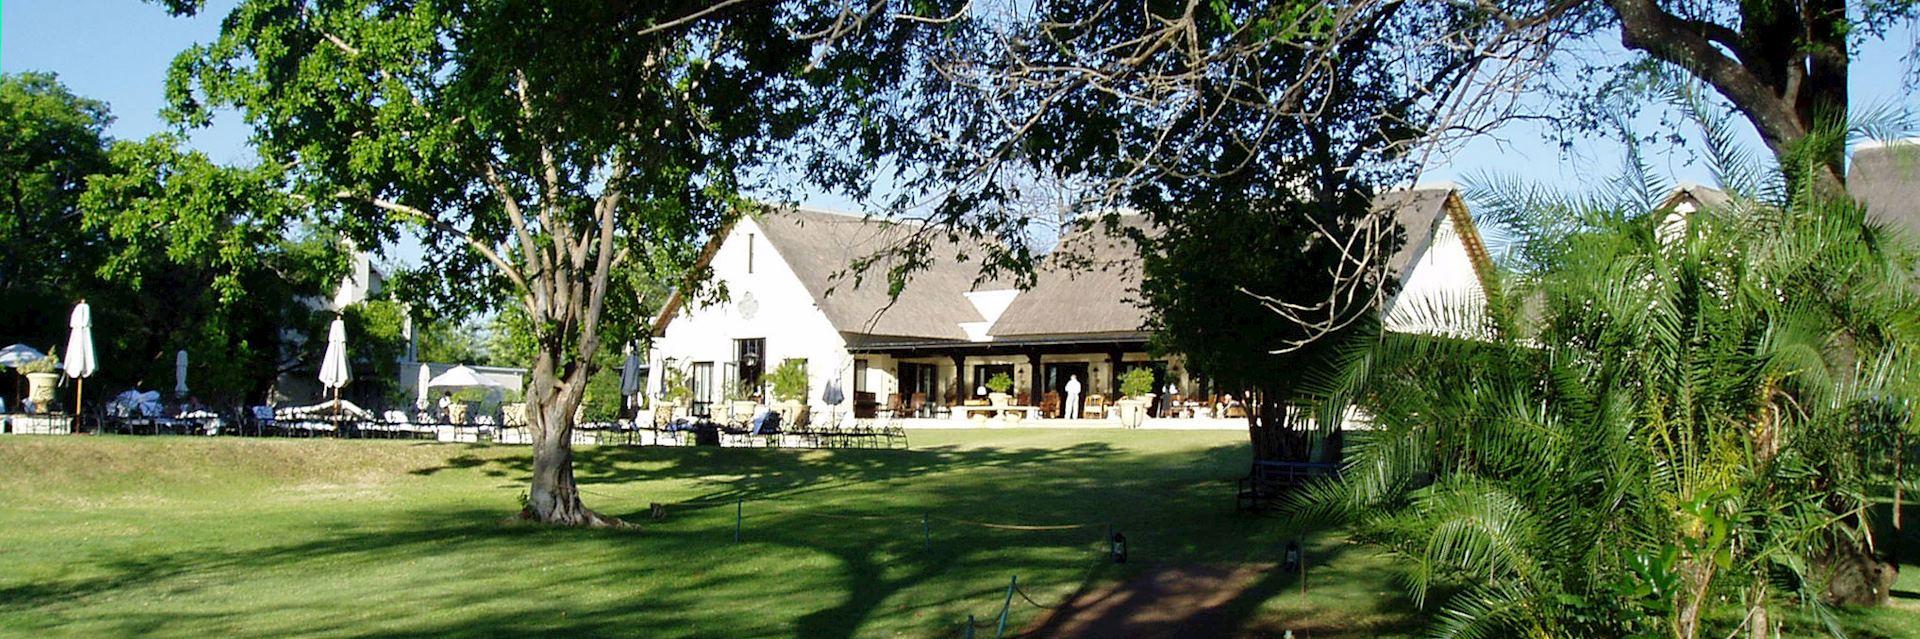 Royal Livingstone Hotel, Livingstone & the Victoria Falls